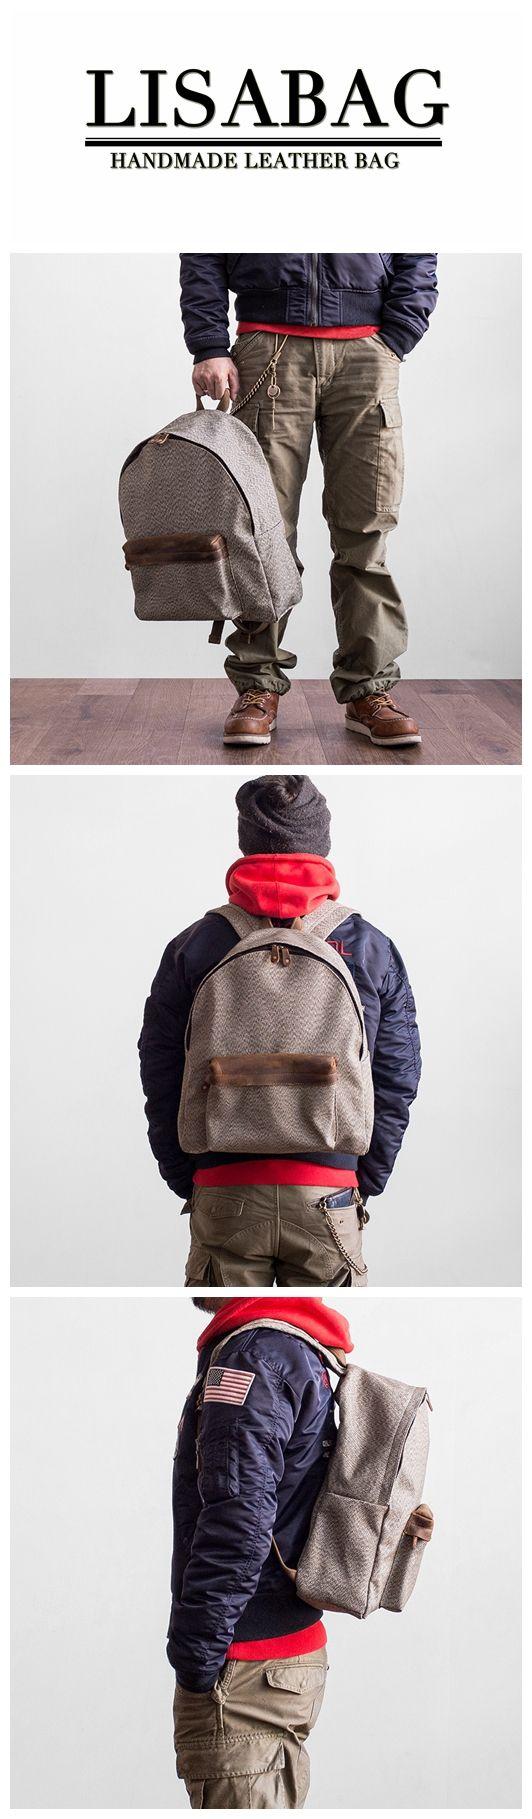 7d3c3c4046 Handcrafted Canvas School Backpack College Bag Laptop Rucksack Travel  Backpack MBL28